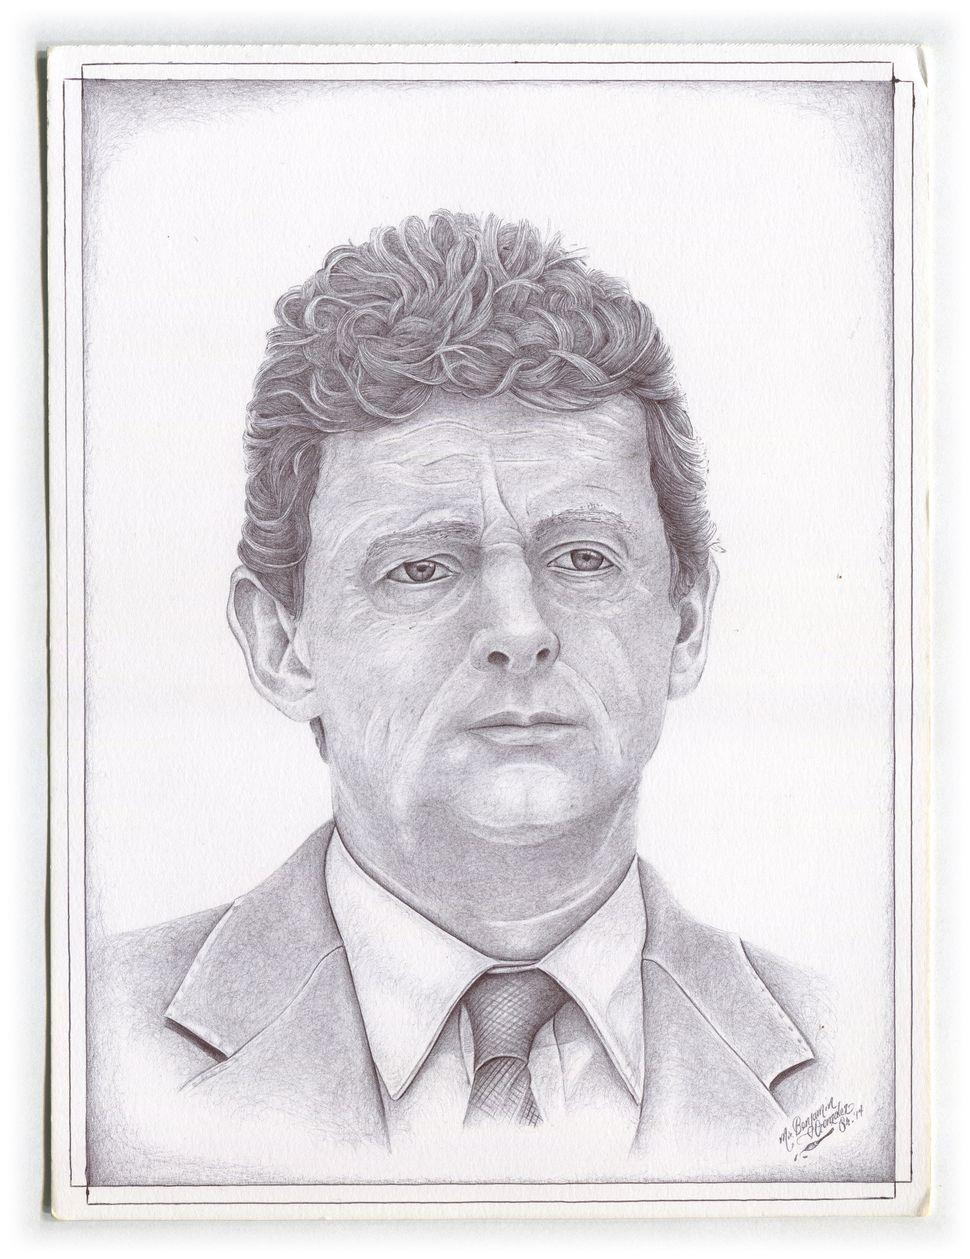 Benjamin Gonzalez Sr. (Prison ID#17554404) drew former CEO of BP TonyHayward. Hayward is accused of environmental